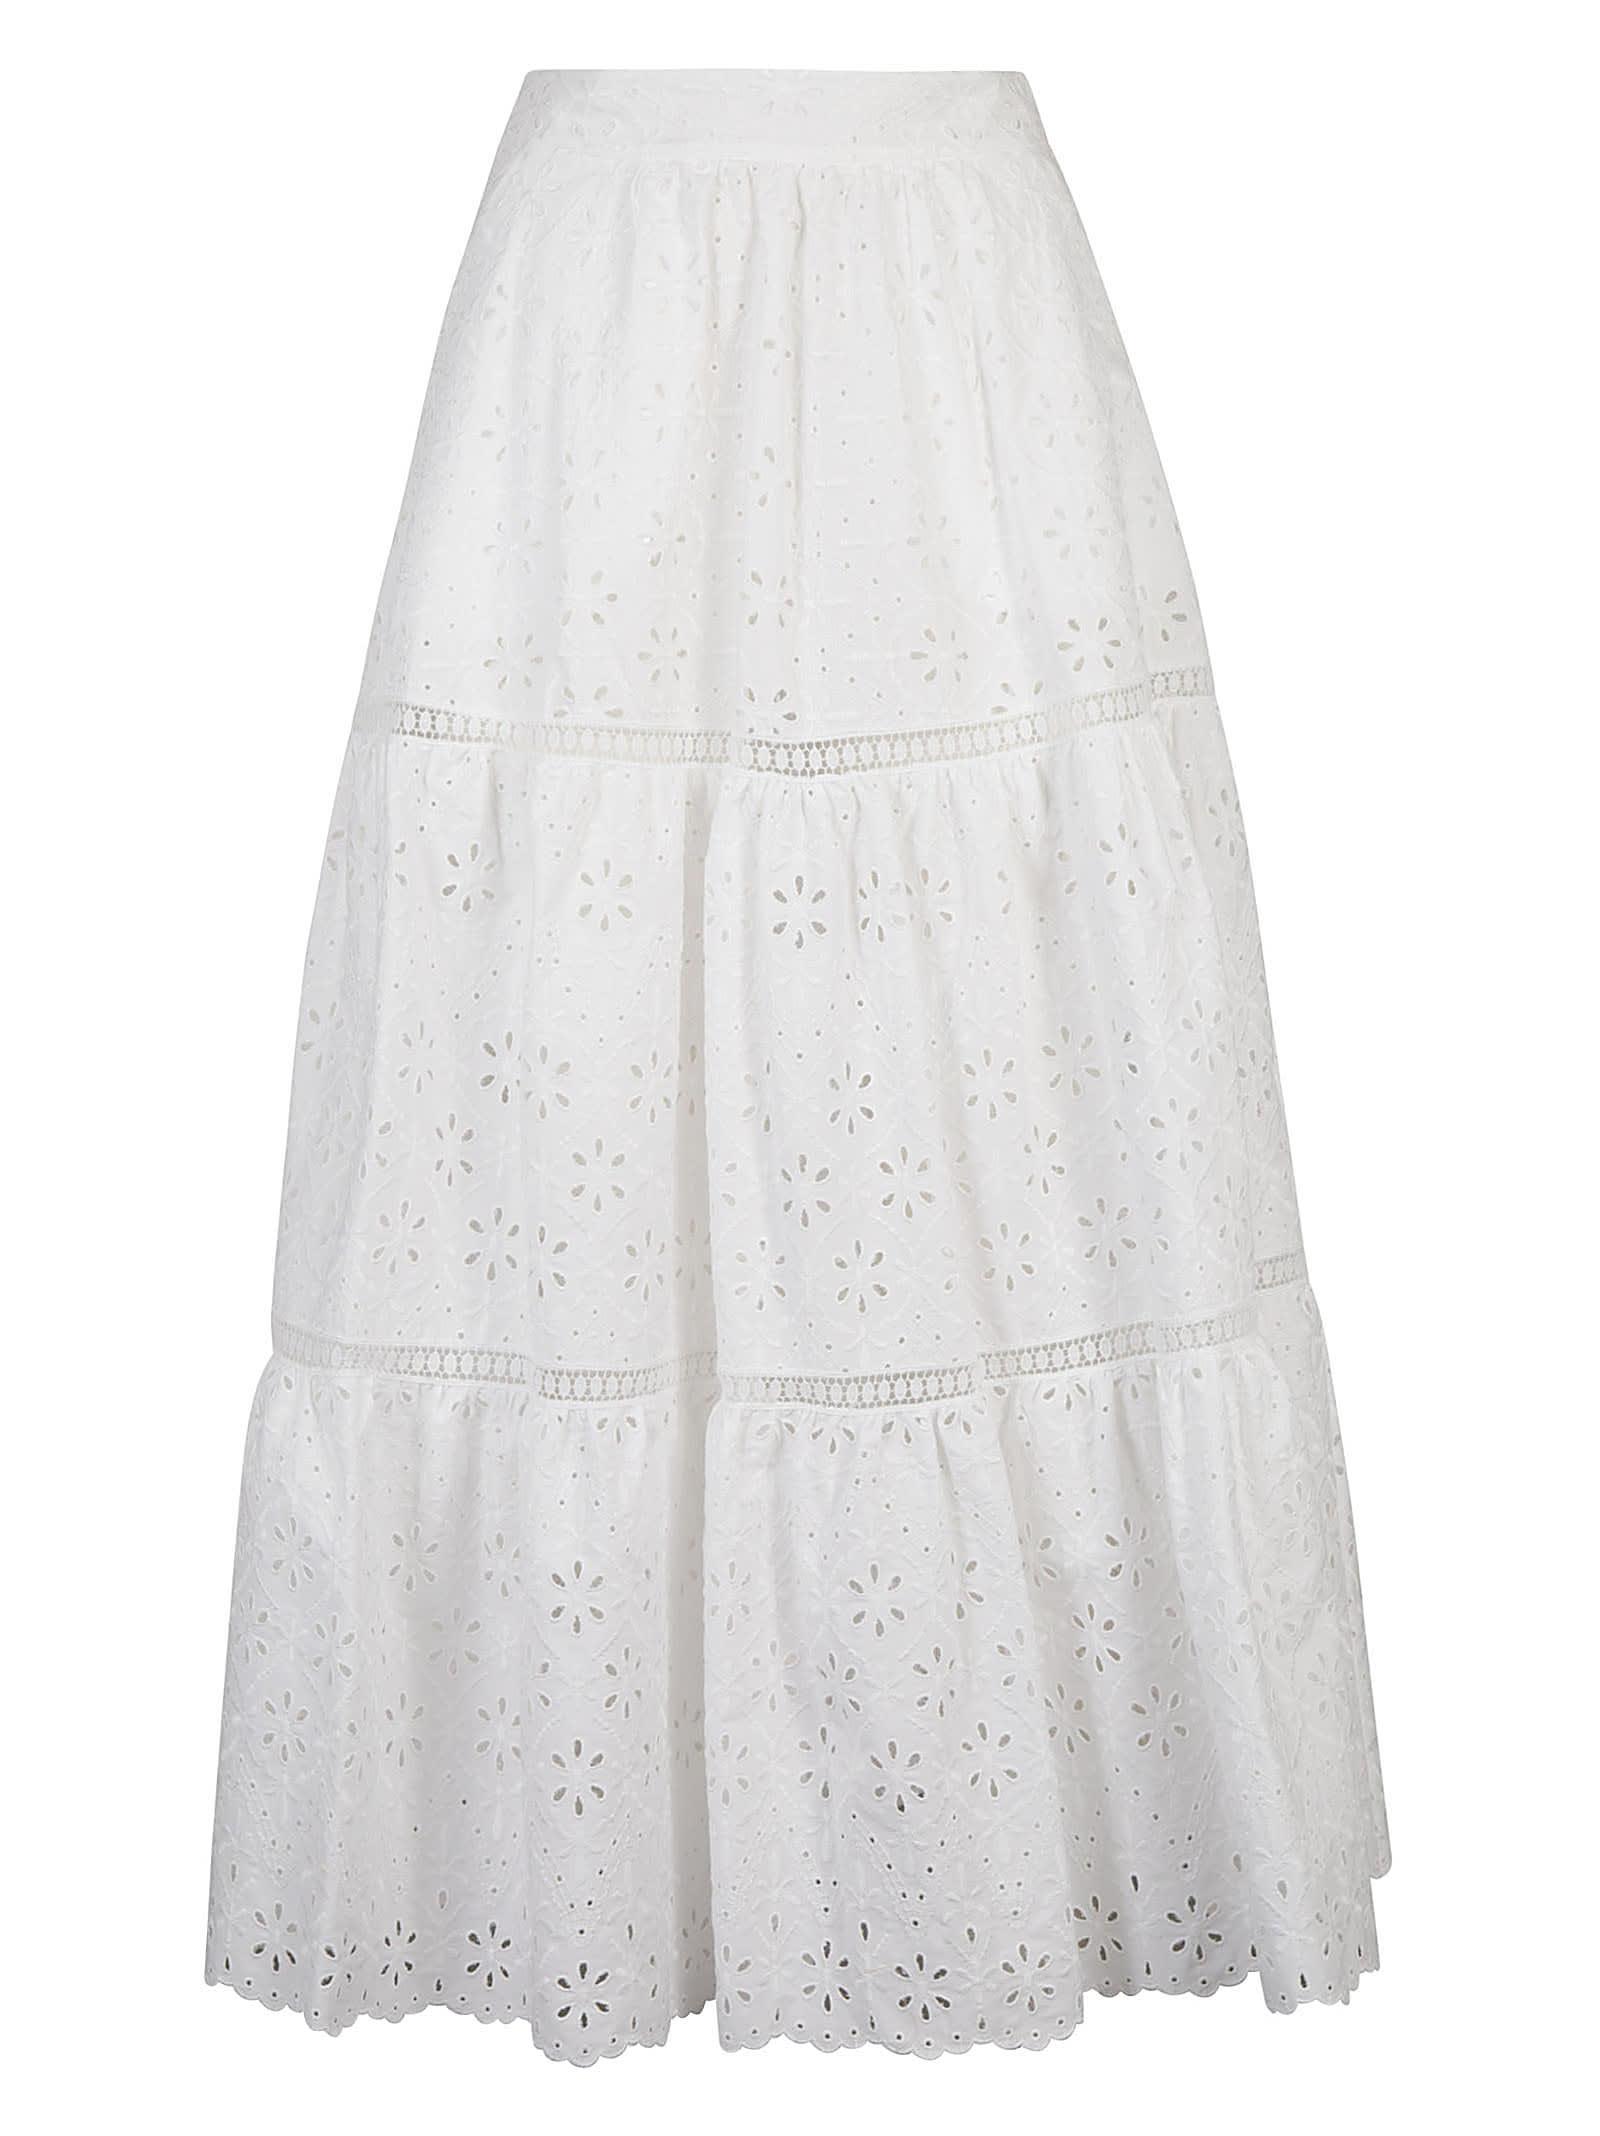 Parosh Flared Floral Perforated Skirt